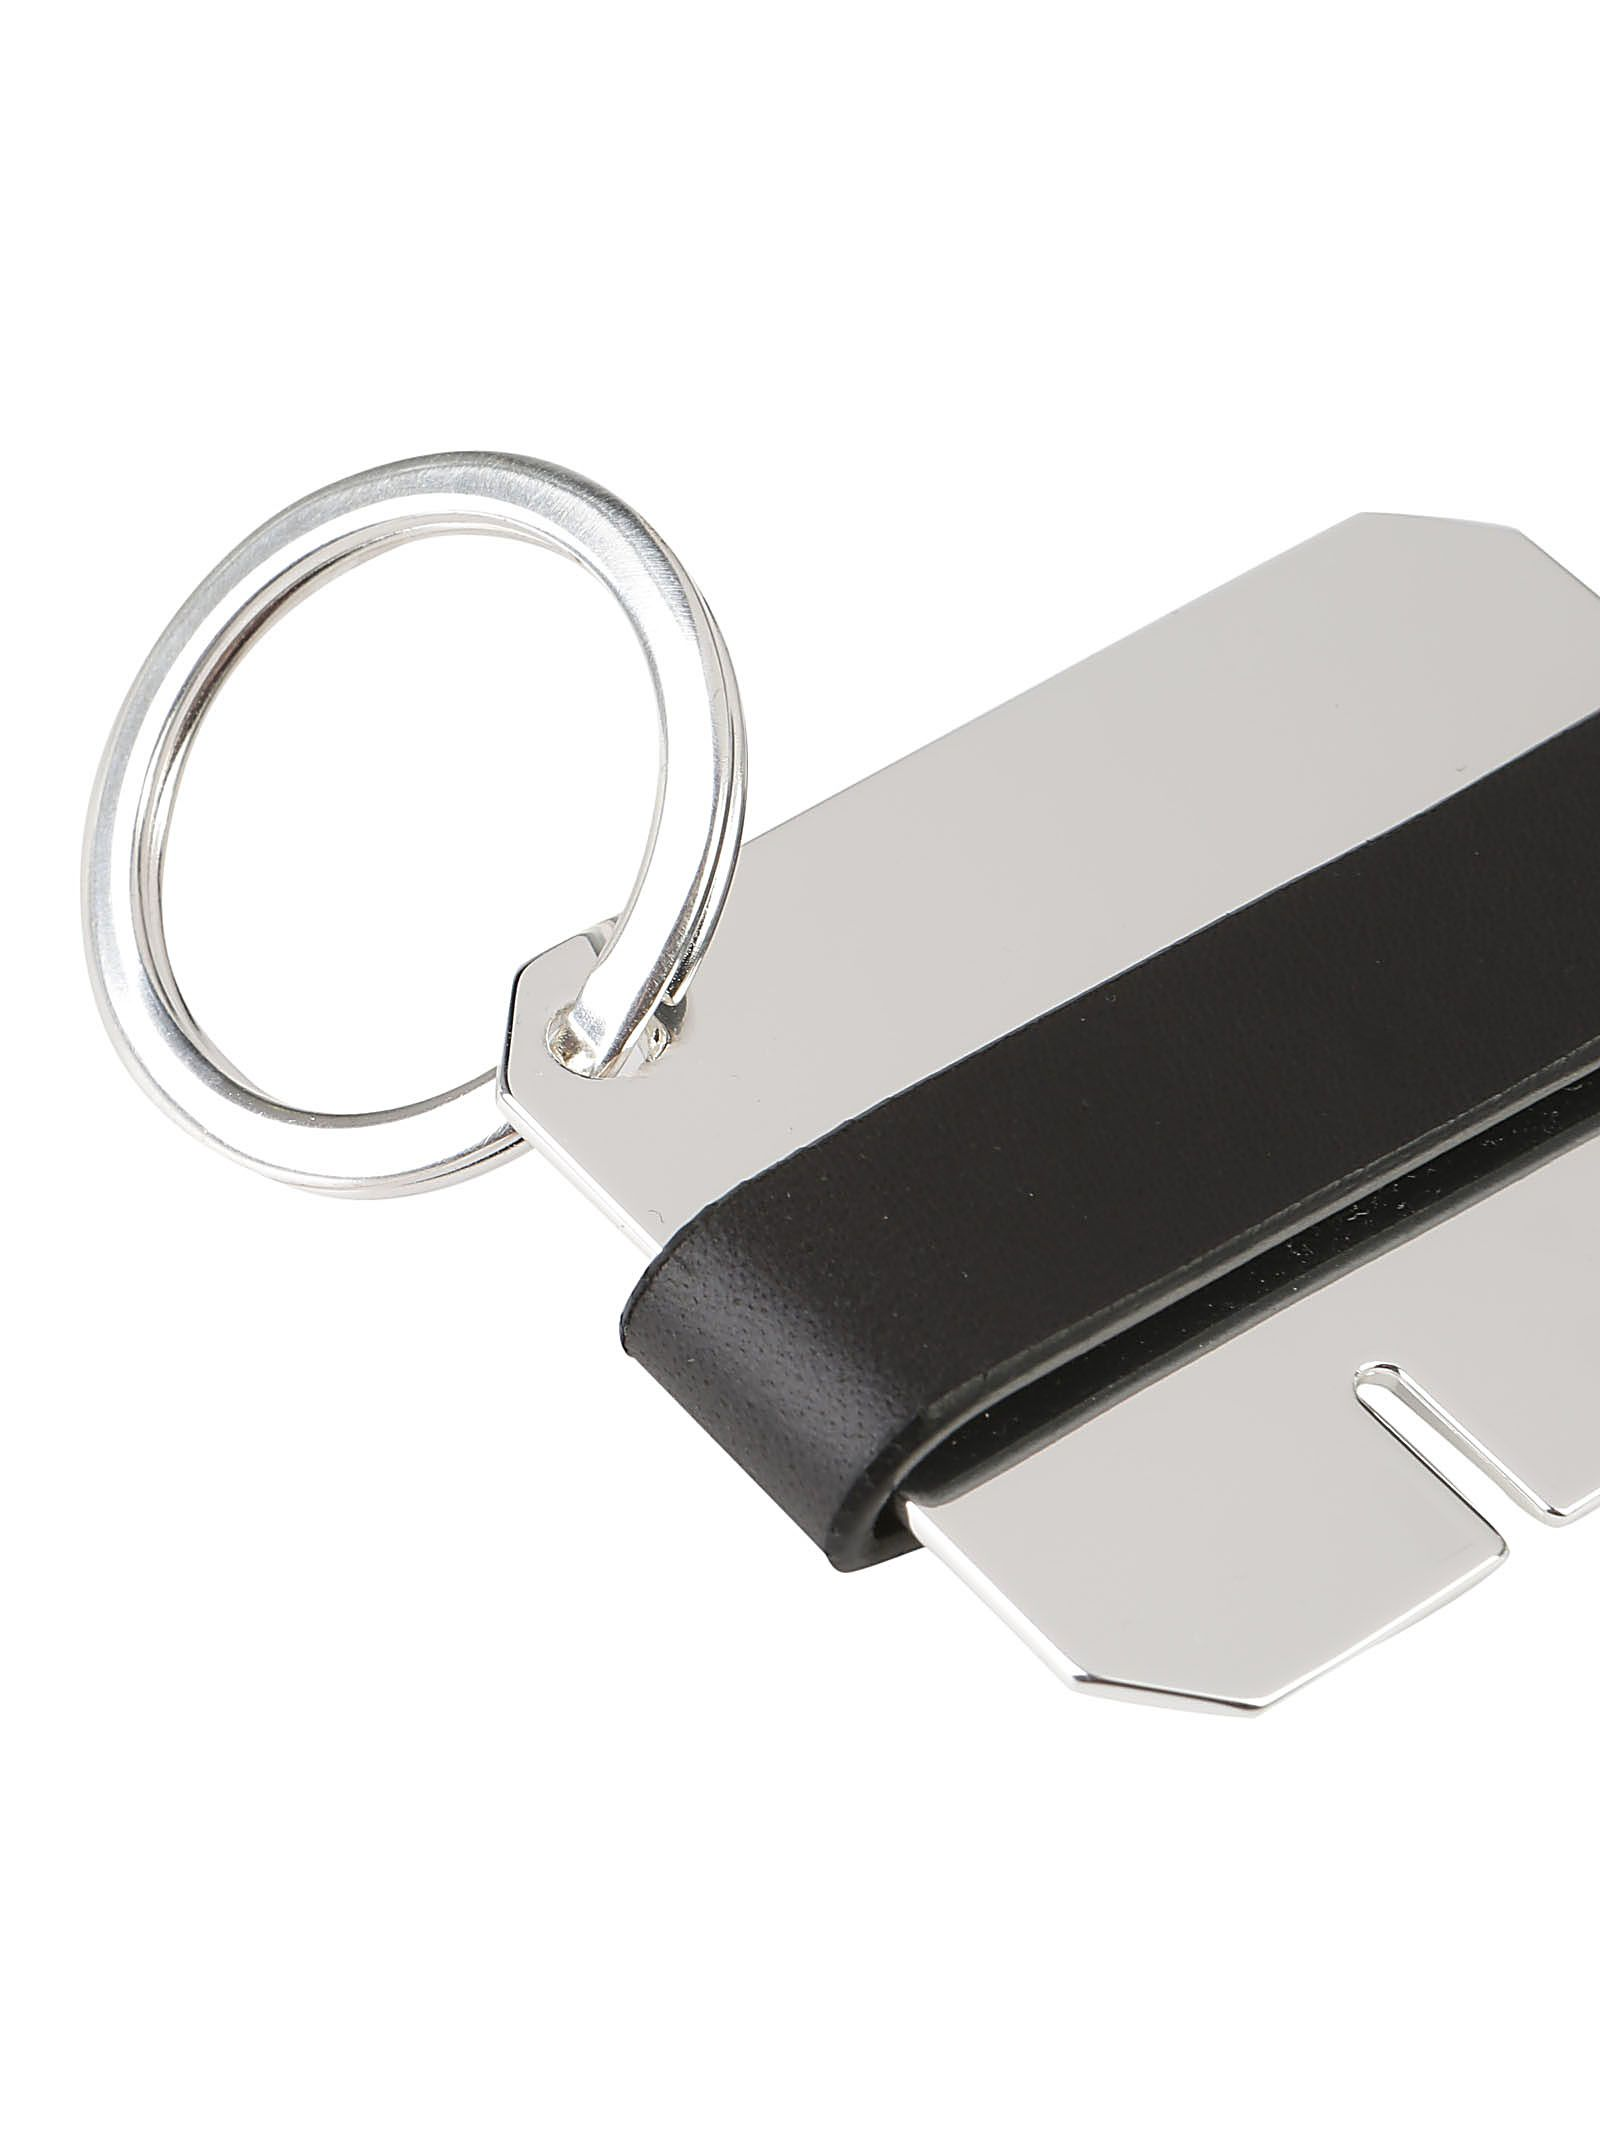 Maison Martin Margiela Credit card metal key ring 51lyAf4LHj